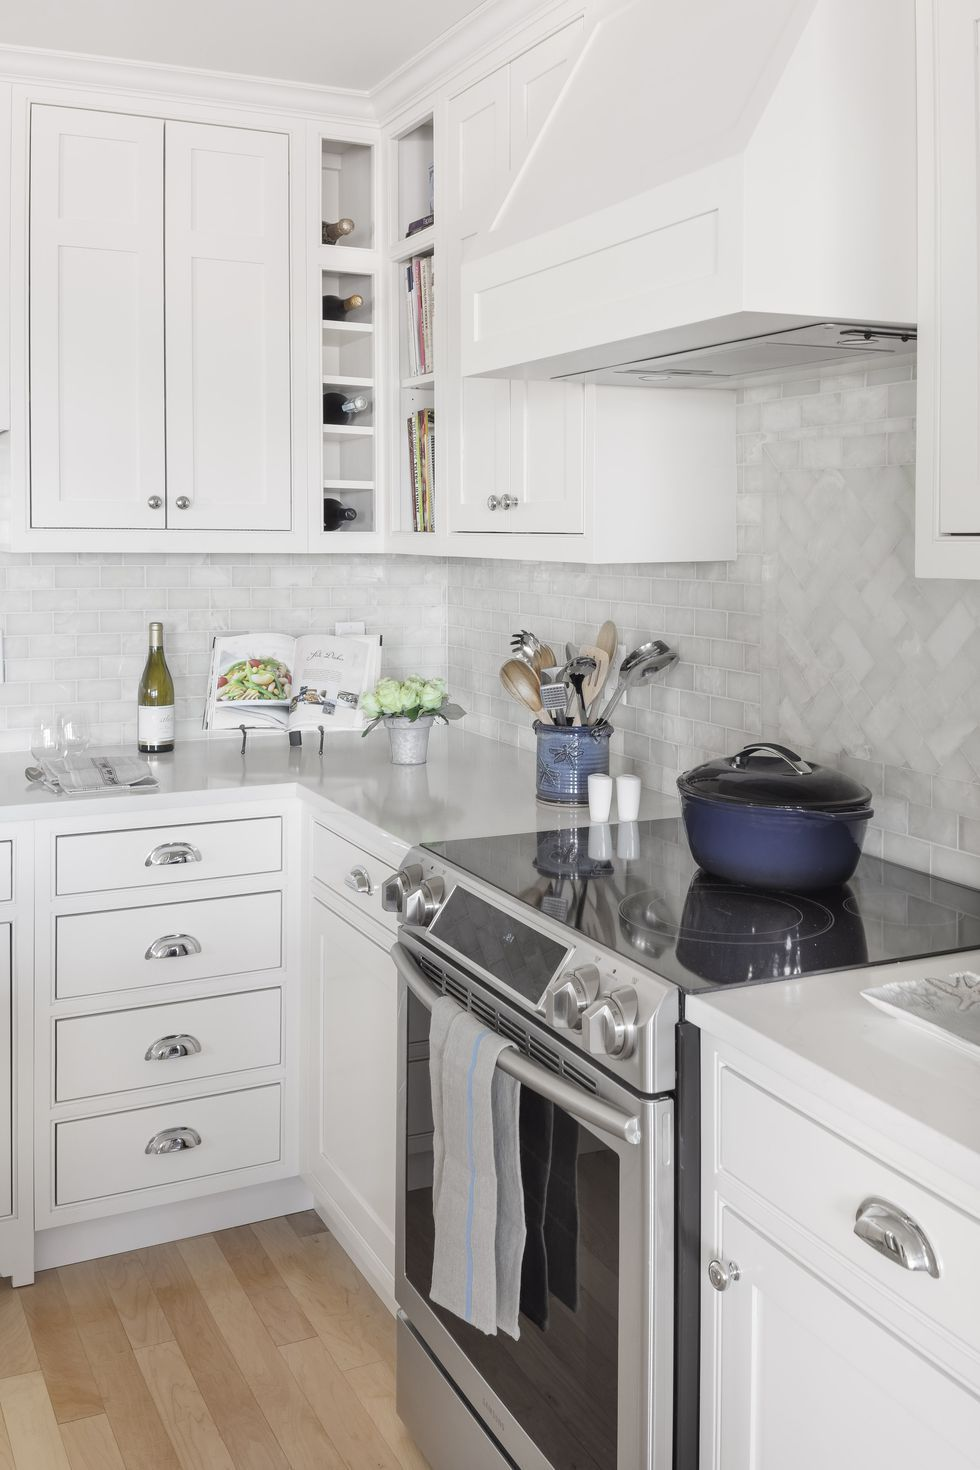 20 gorgeous kitchen tile backsplashes best kitchen tile ideas rh elledecor com Inexpensive Backsplash Tiles for Kitchen Peel and Stick Tiles for Kitchen Backsplash